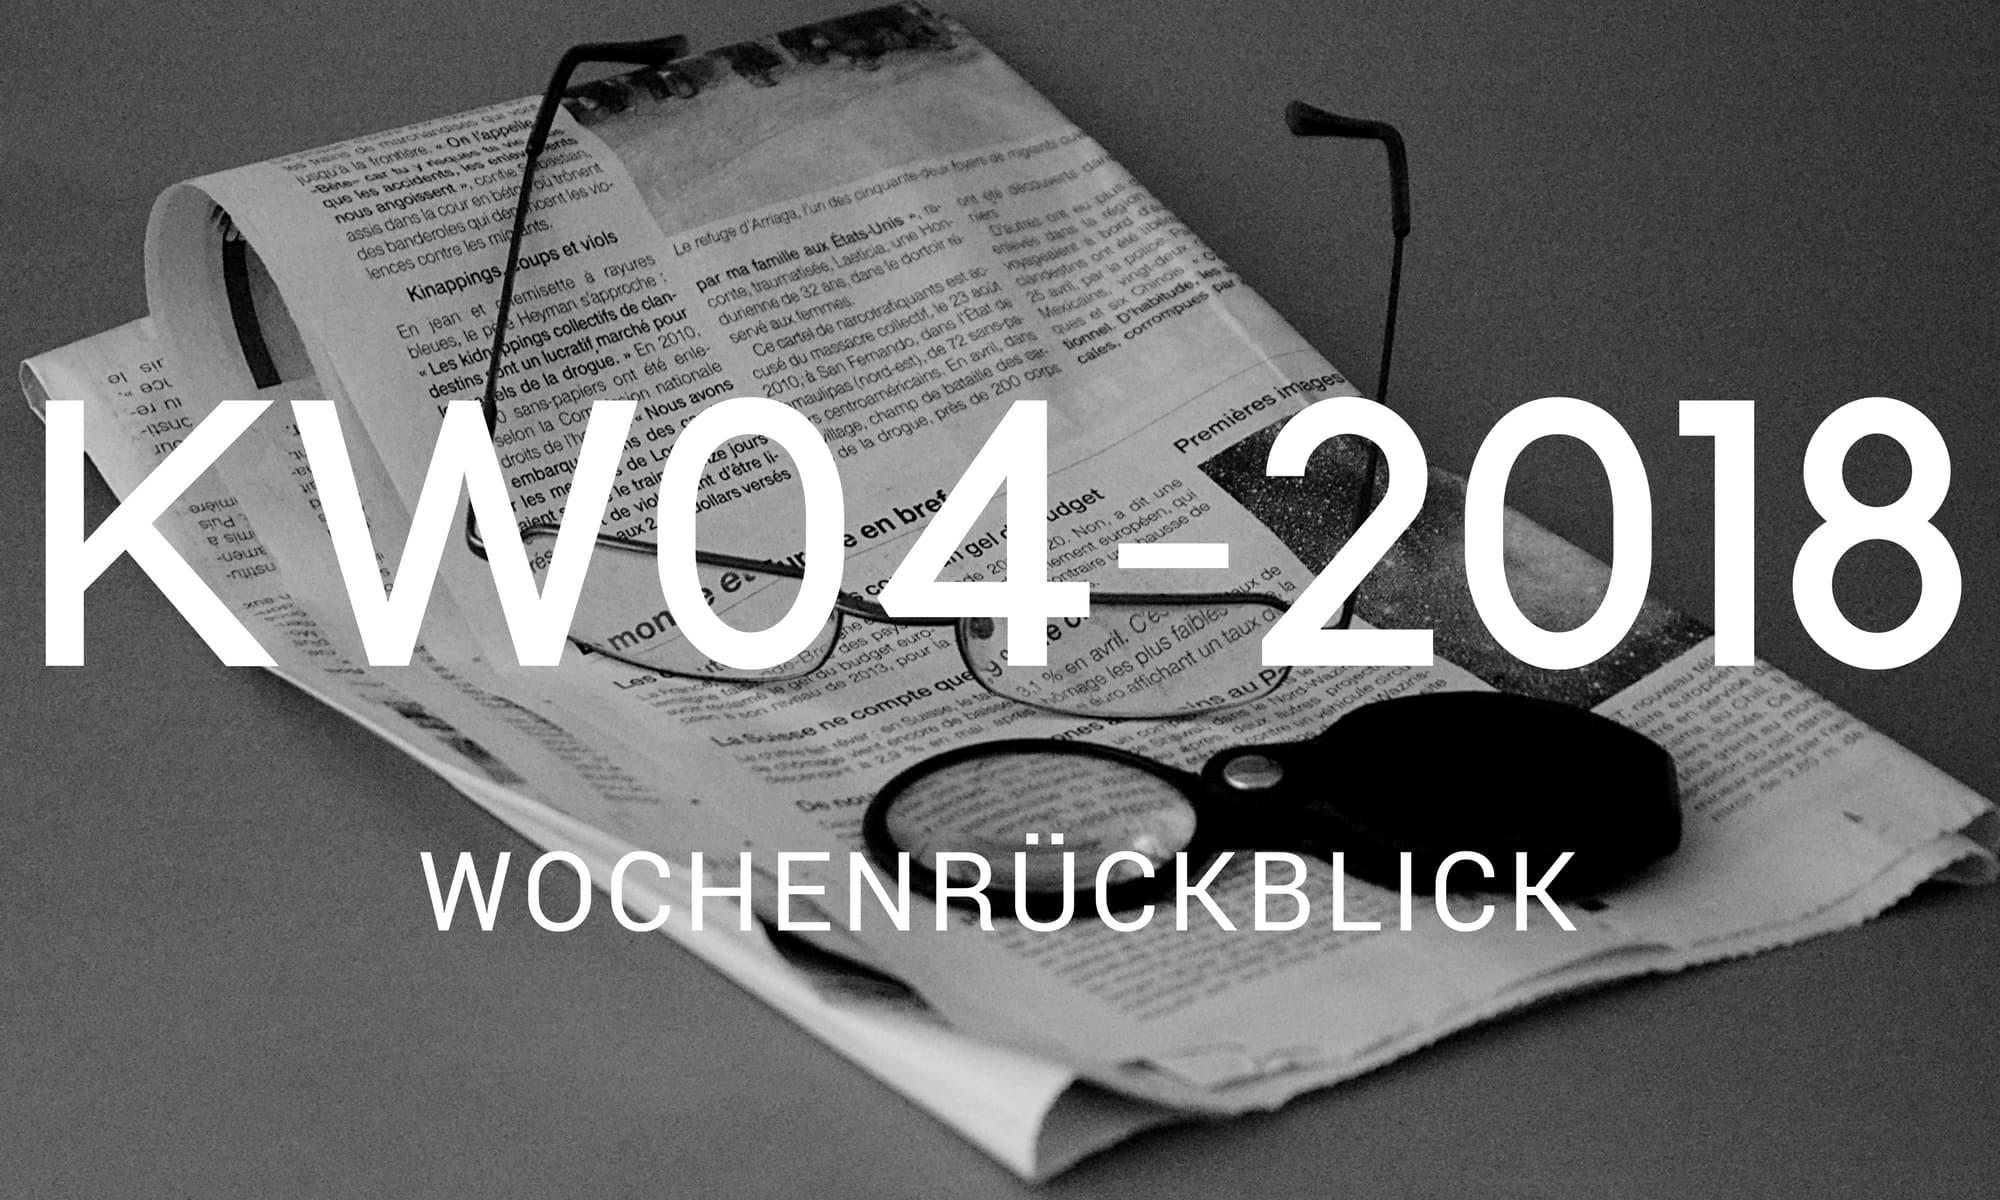 wochenrueckblick camping news KW04-2018